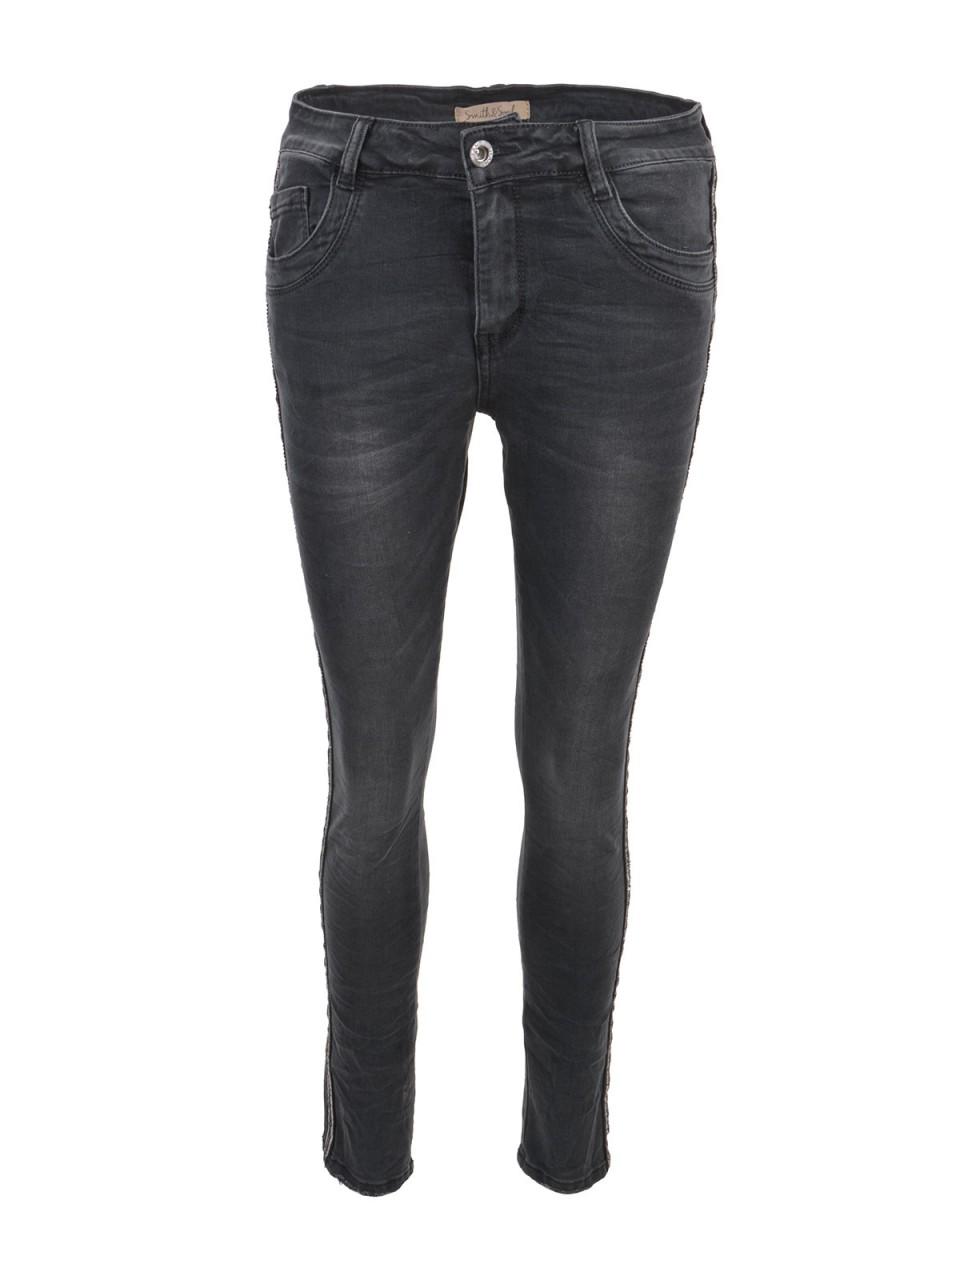 Hosen - SMITH SOUL Damen Jeans, schwarz  - Onlineshop Designermode.com